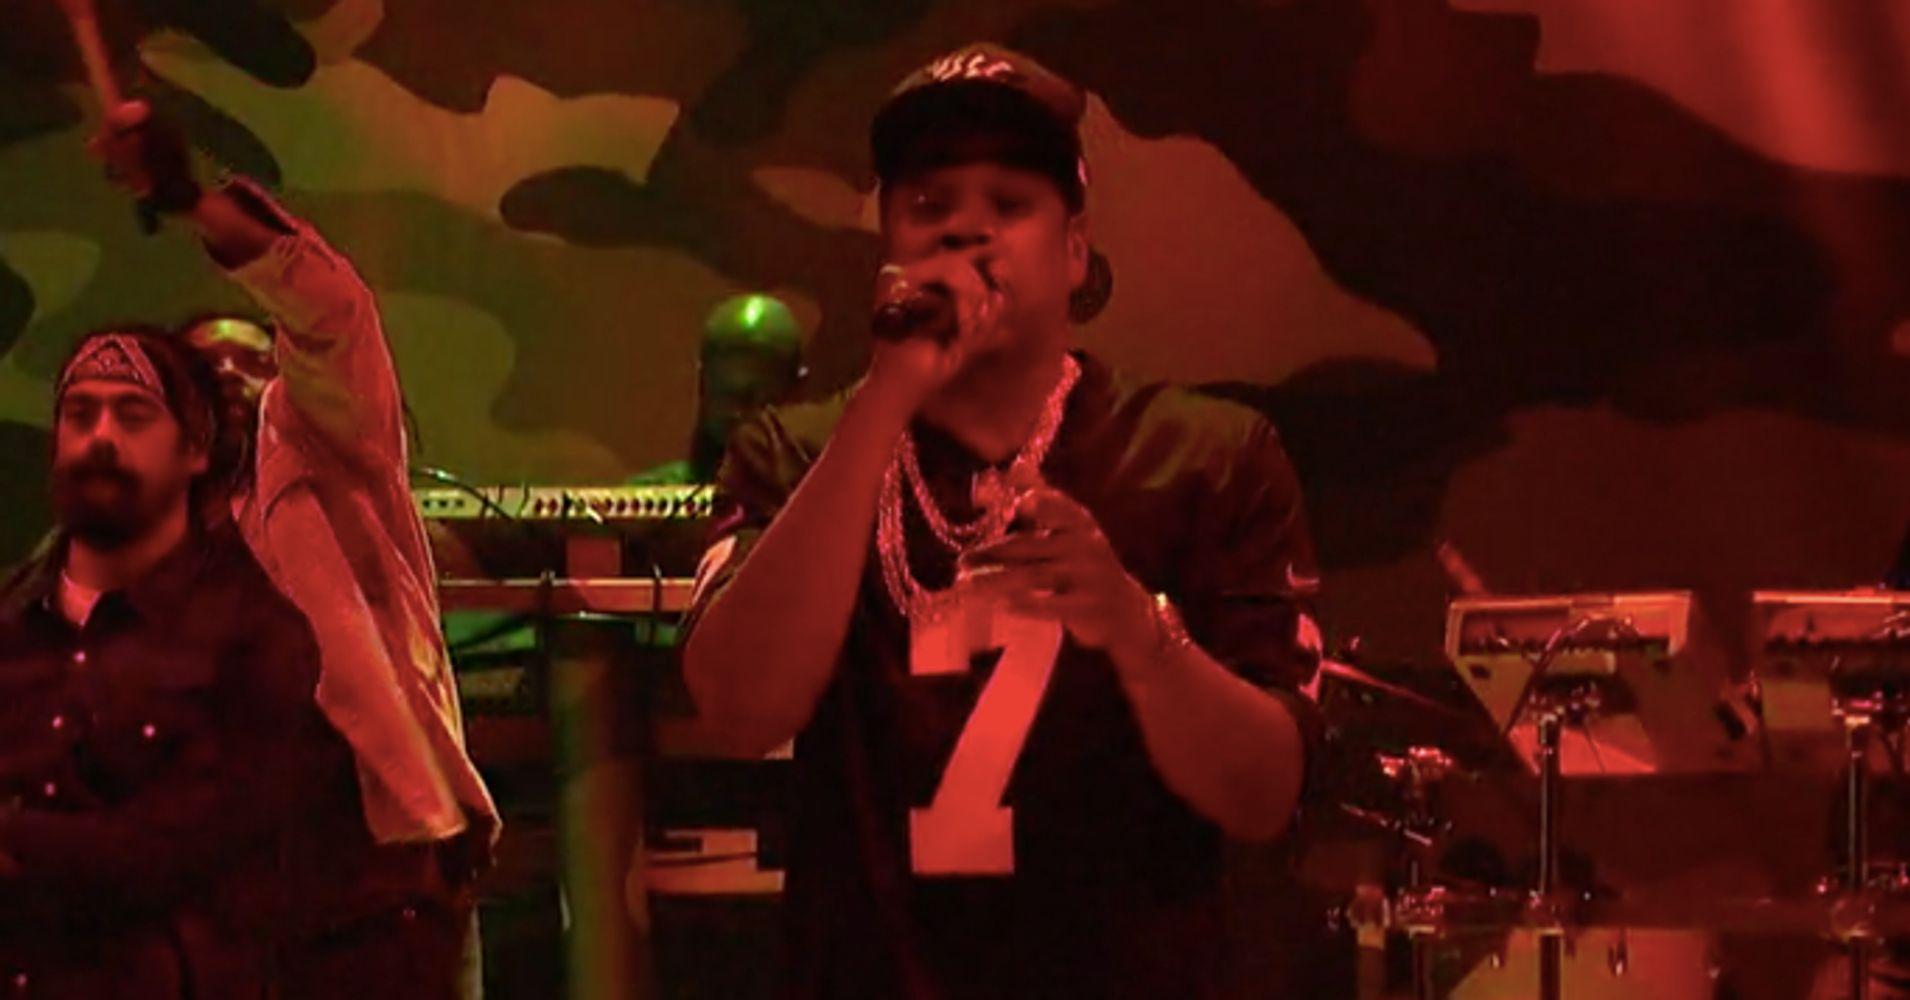 115e4c9ac59 Jay-Z Honors Colin Kaepernick On 'Saturday Night Live' | HuffPost